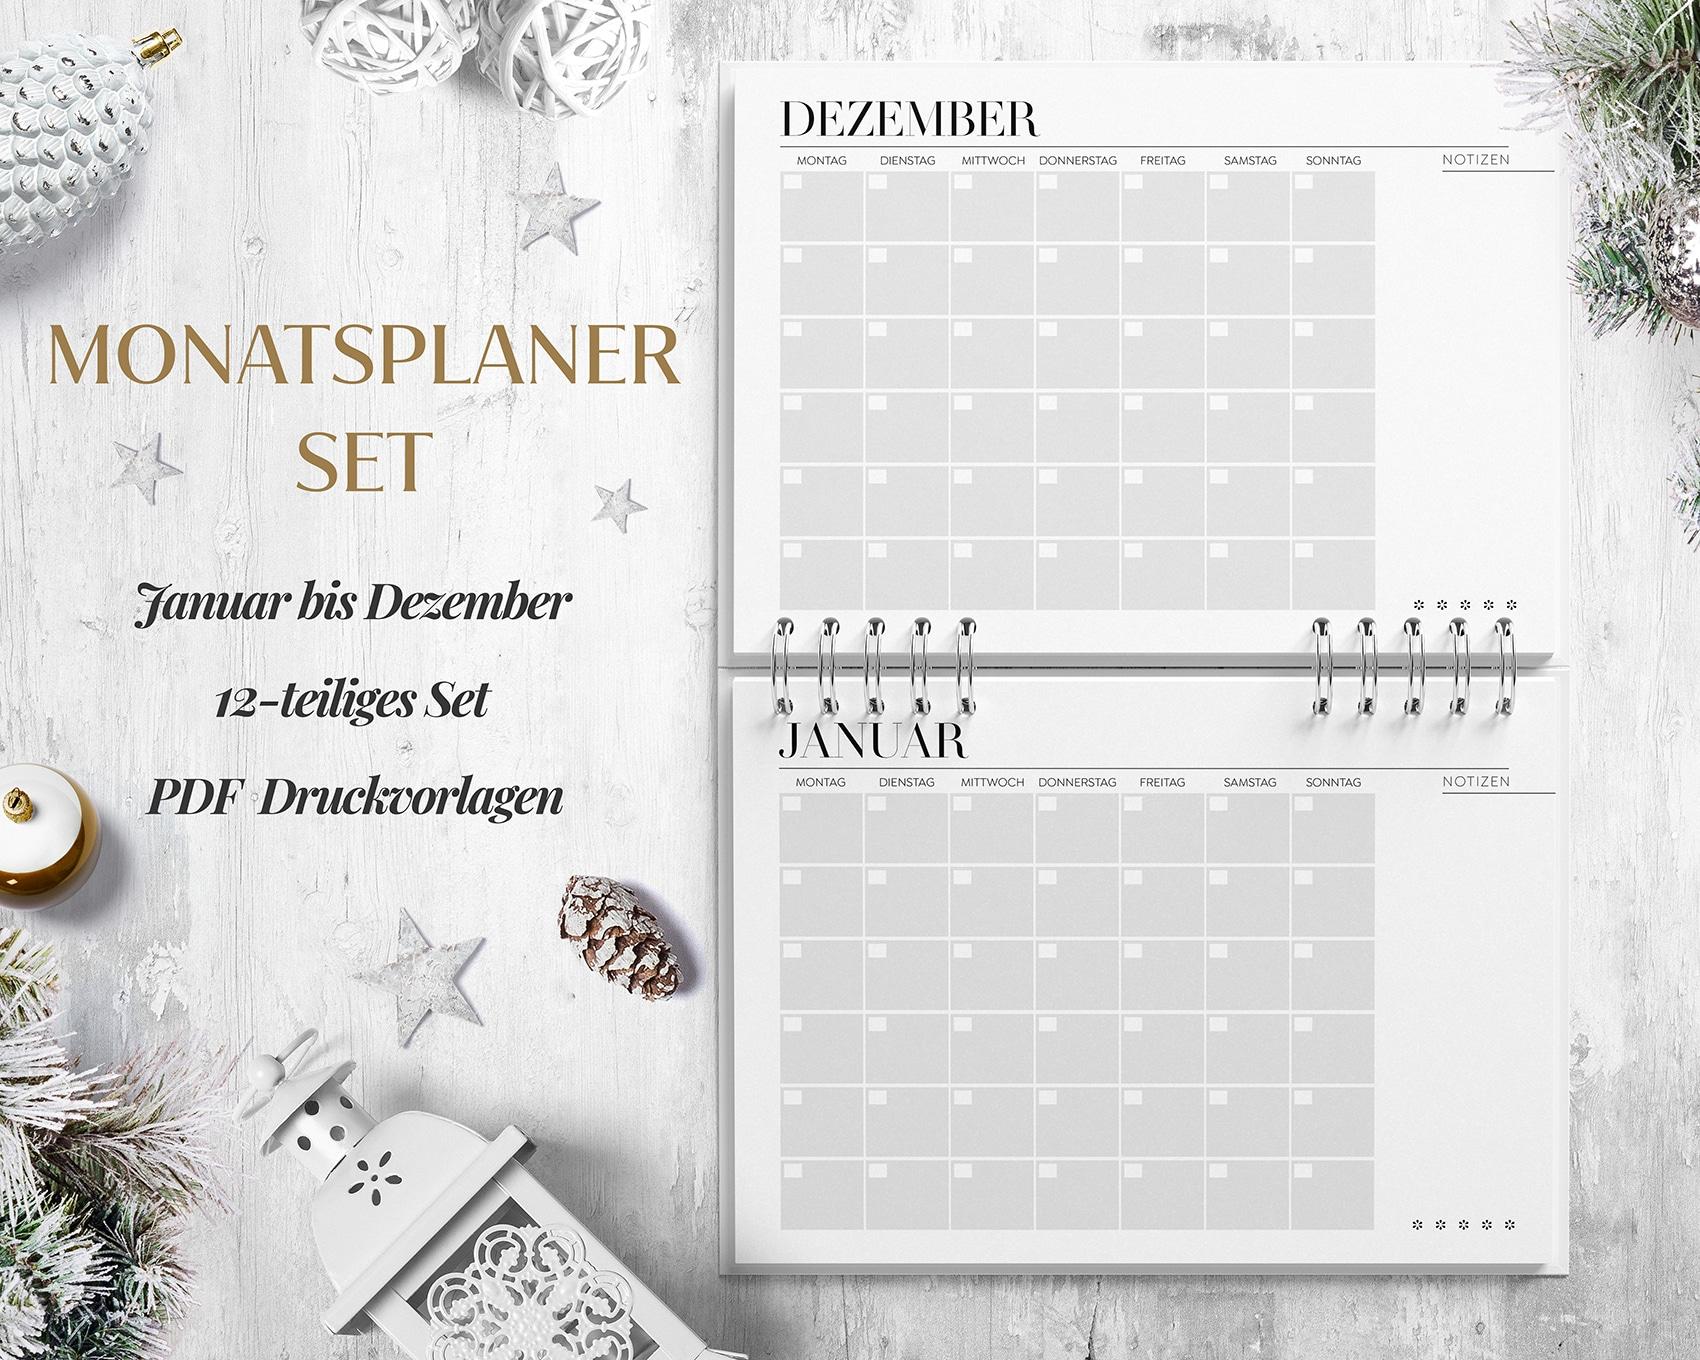 Monatsplaner PDF Monatskalender Januar Dezember